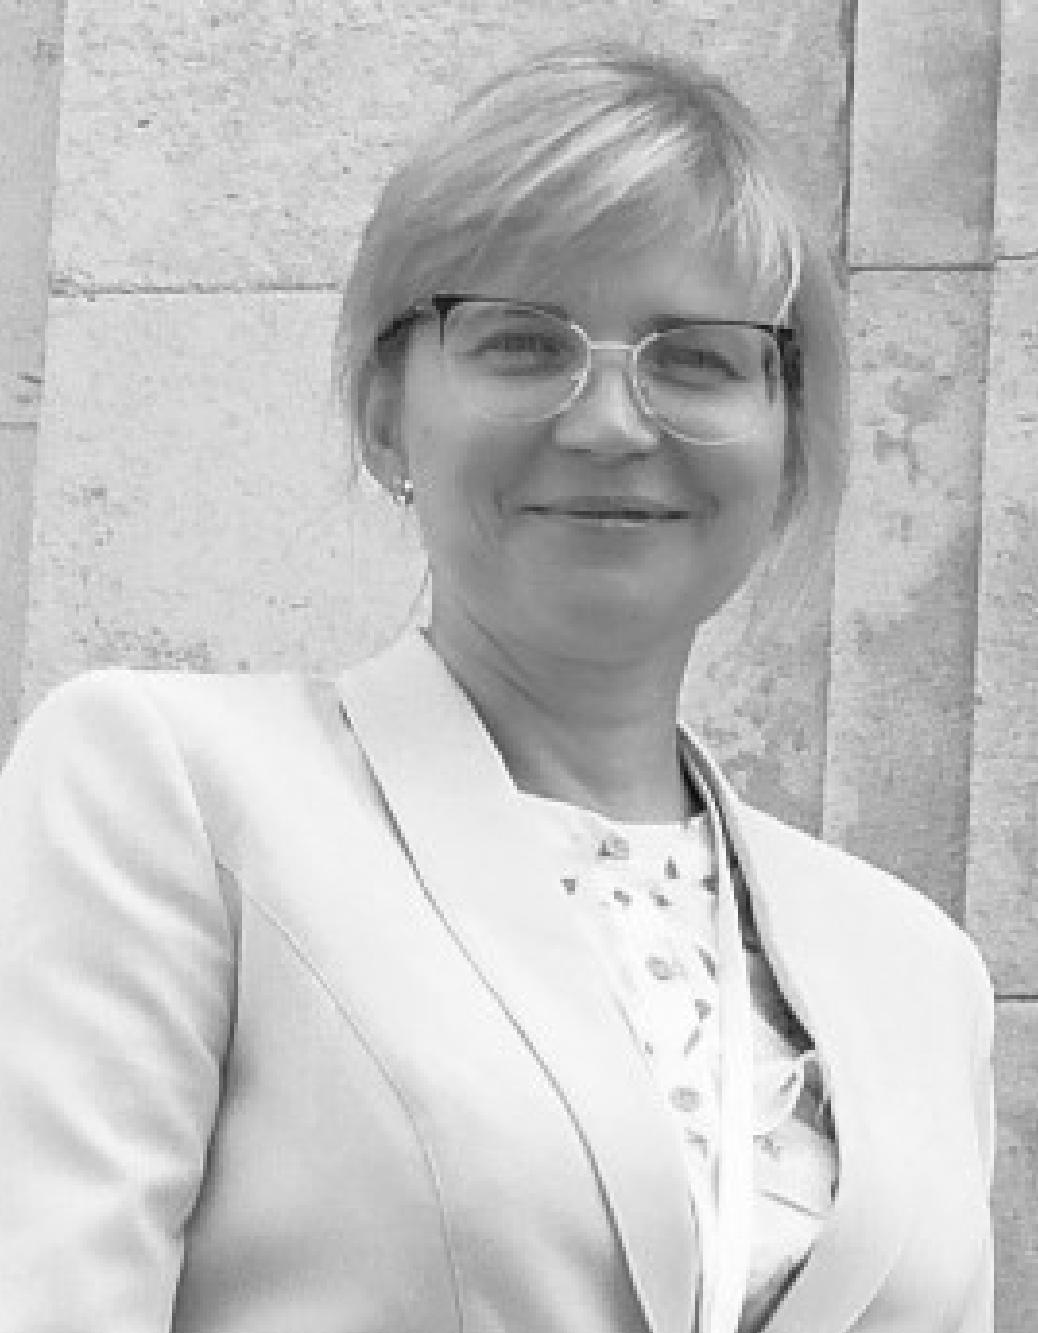 <b>Daria L Varganova (Дарья Варганова)</b>